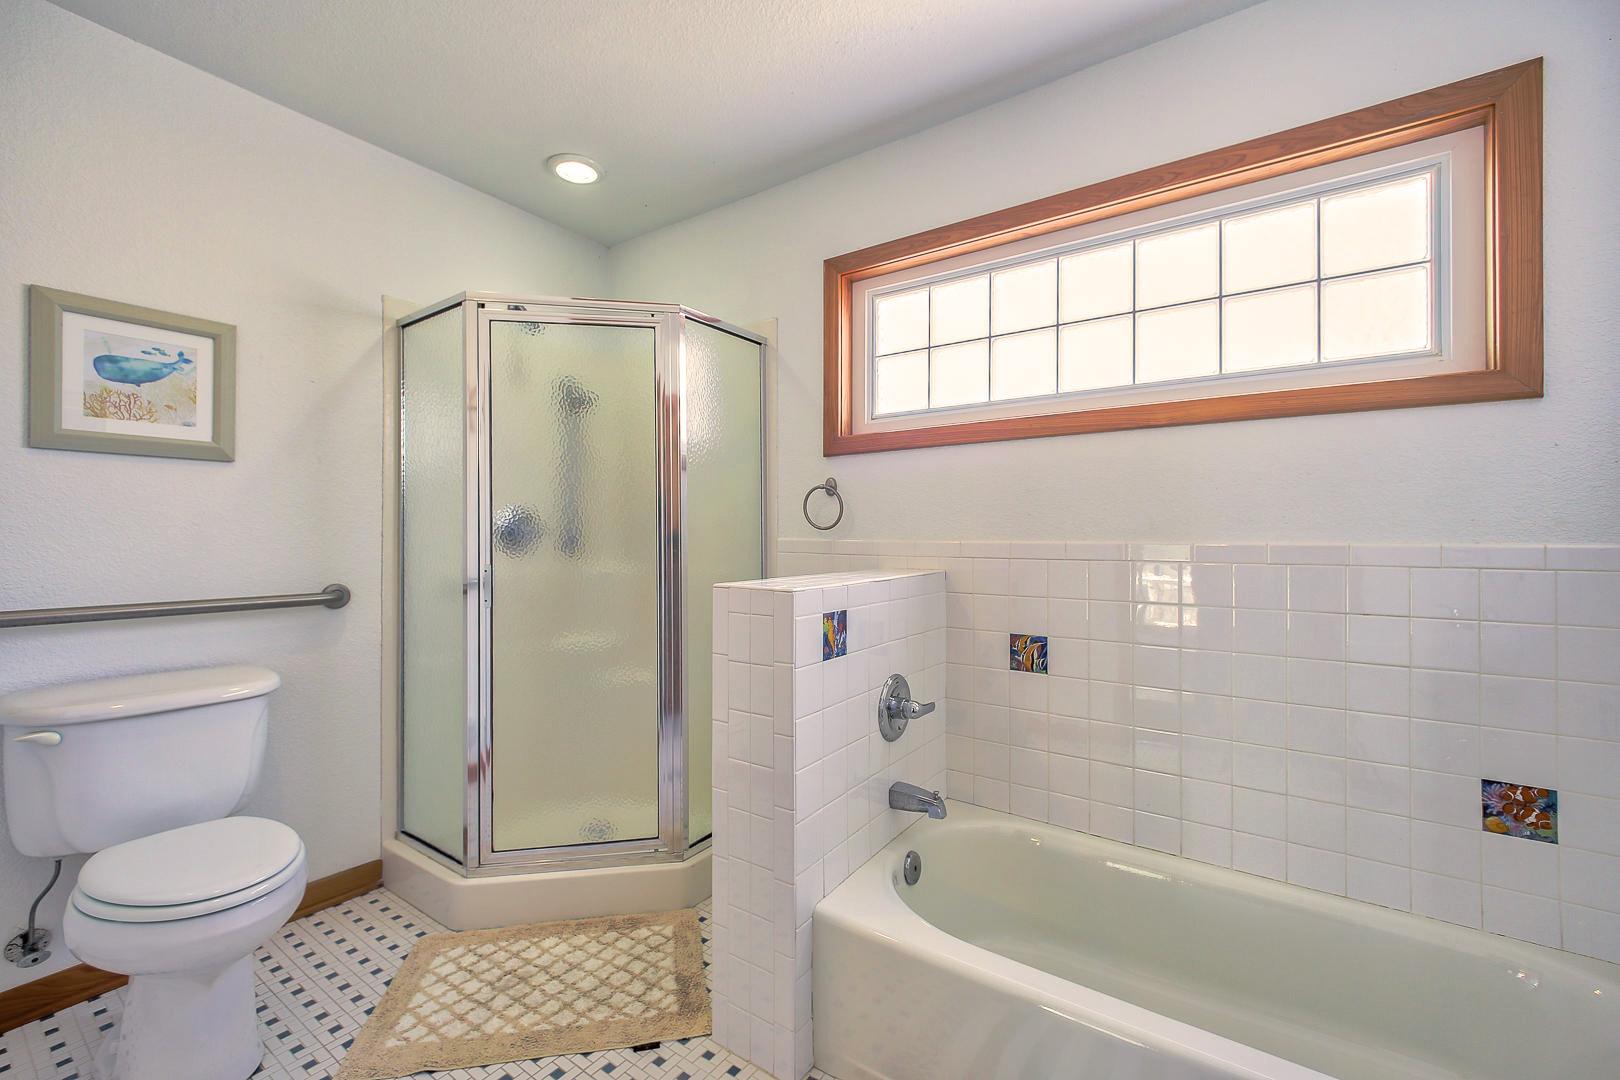 Ground level Master Bedroom #3 private bathroom